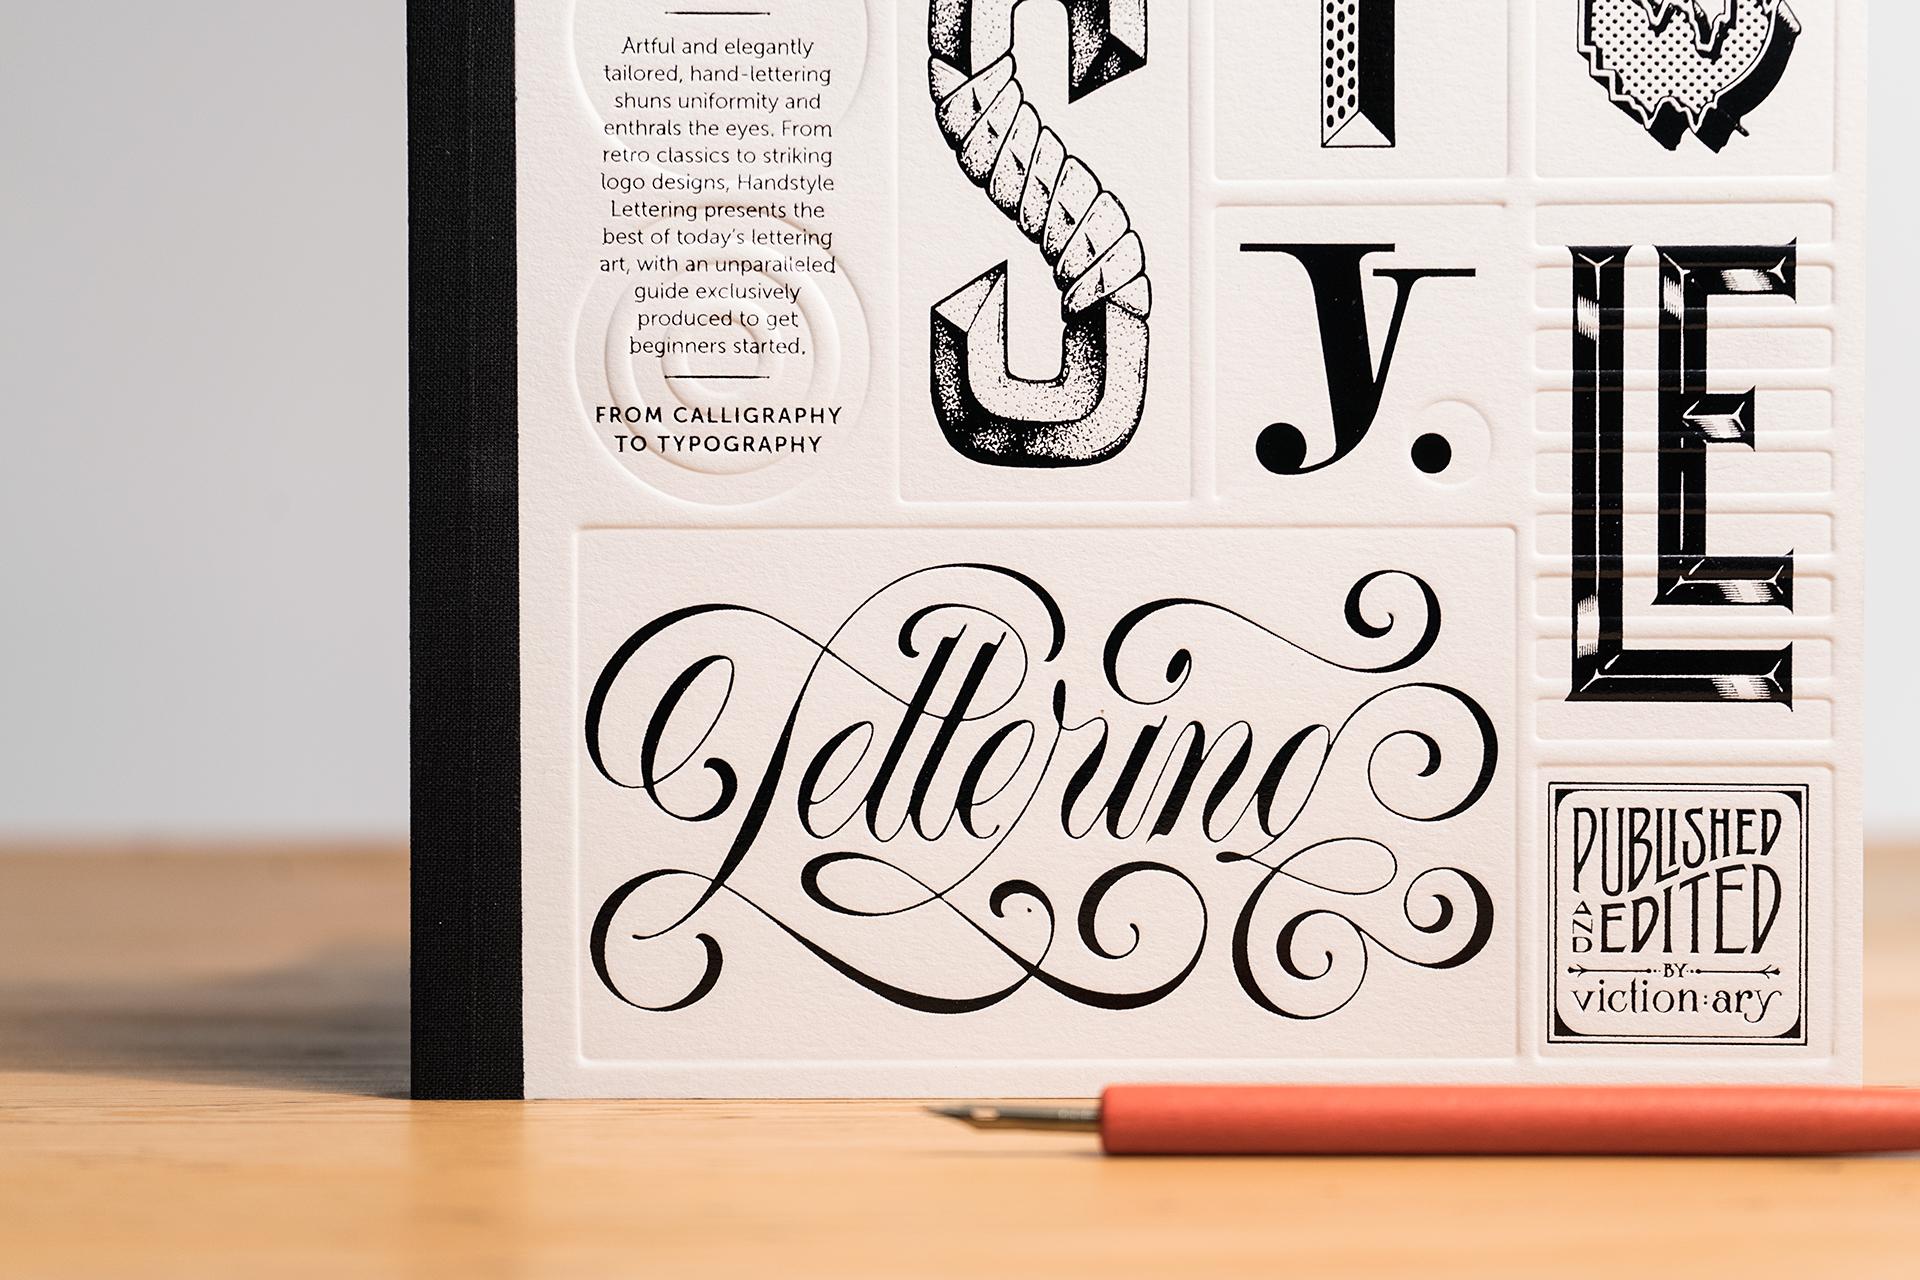 handstyle lettering 2